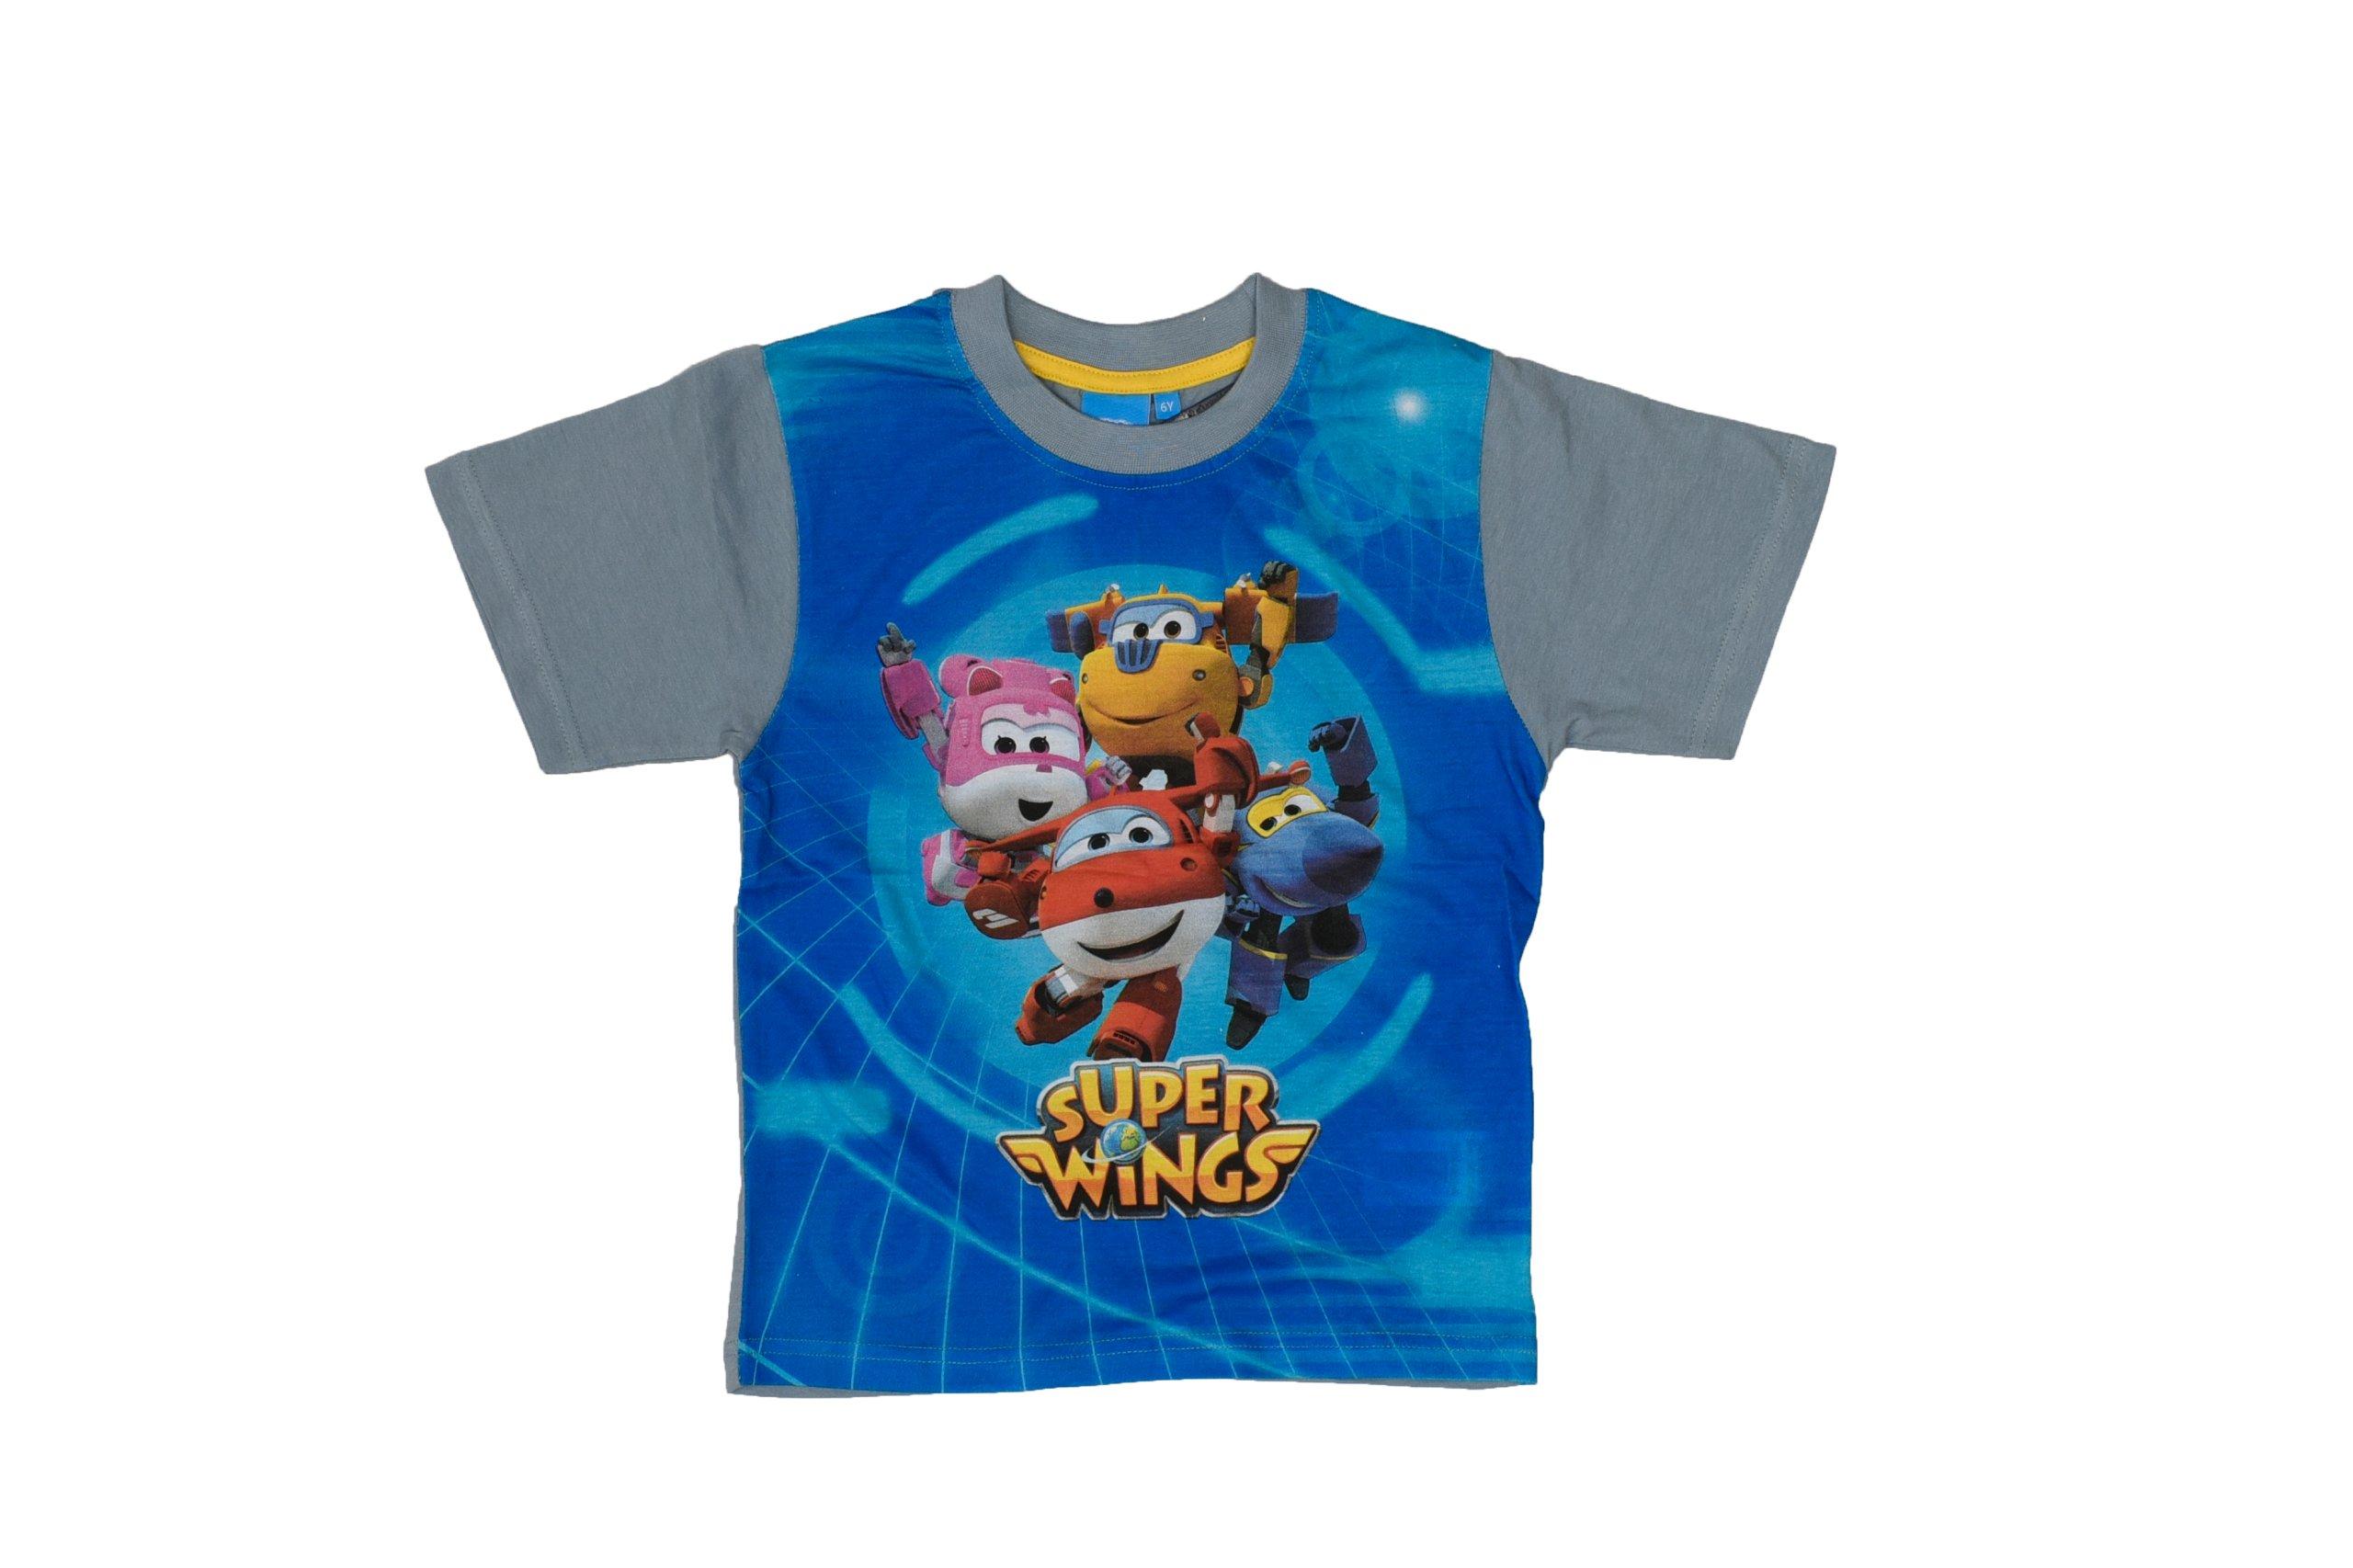 Koszulka T-shirt SUPER WINGS Dżetek Lotek 92 2 l